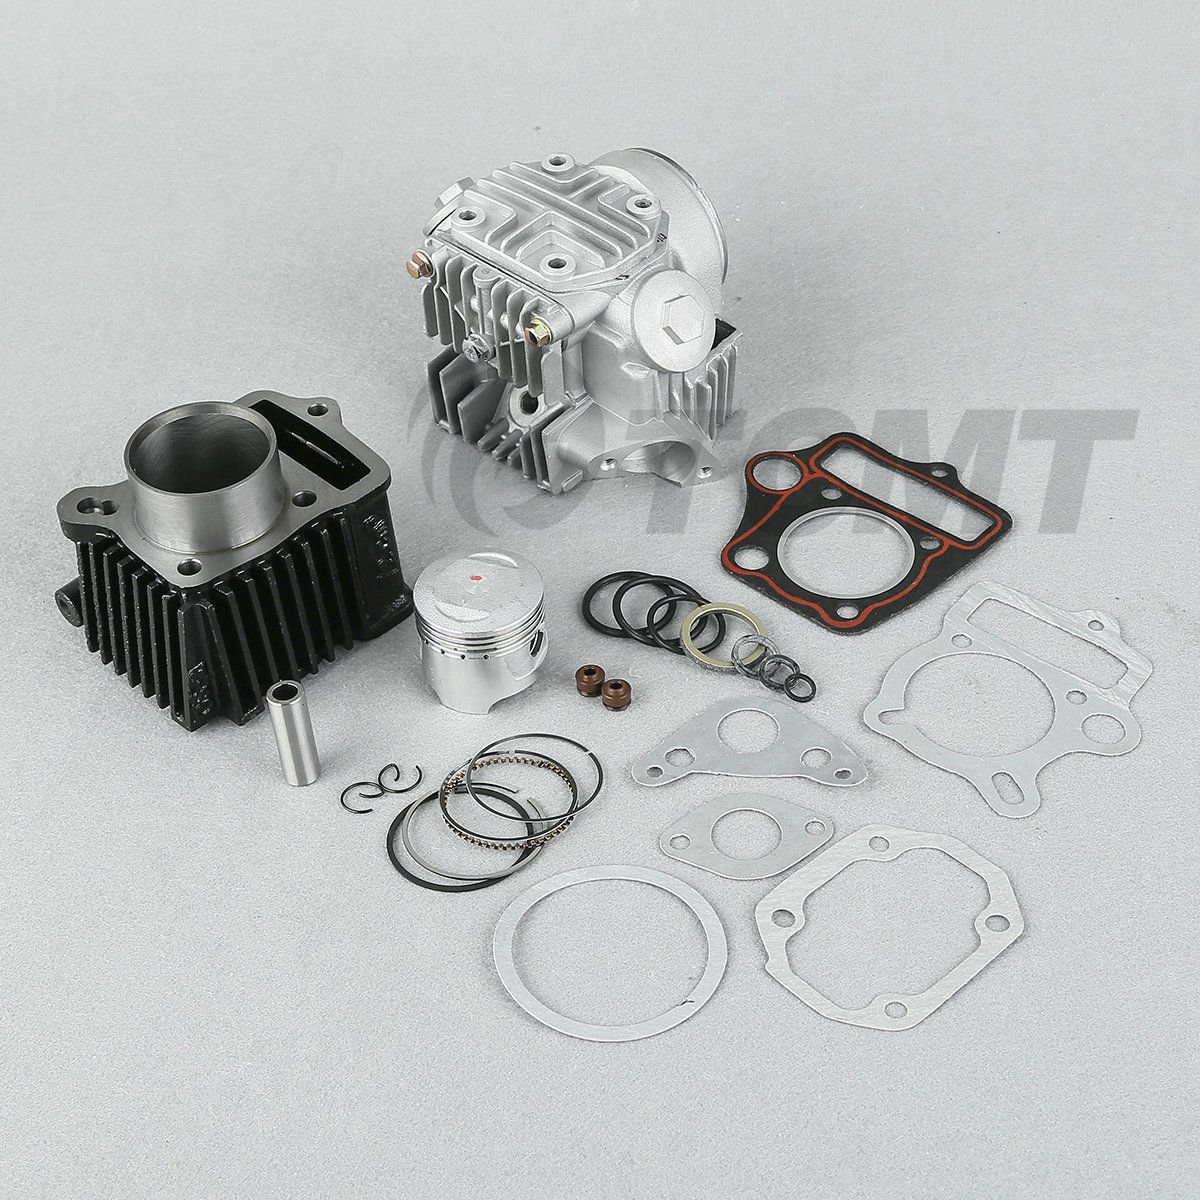 Tcmt Cylinder Engine Rebuild Kit For Honda Atc70 Ct70 1970 Parts List Trx70 Crf70 Xr70 70cc Automotive